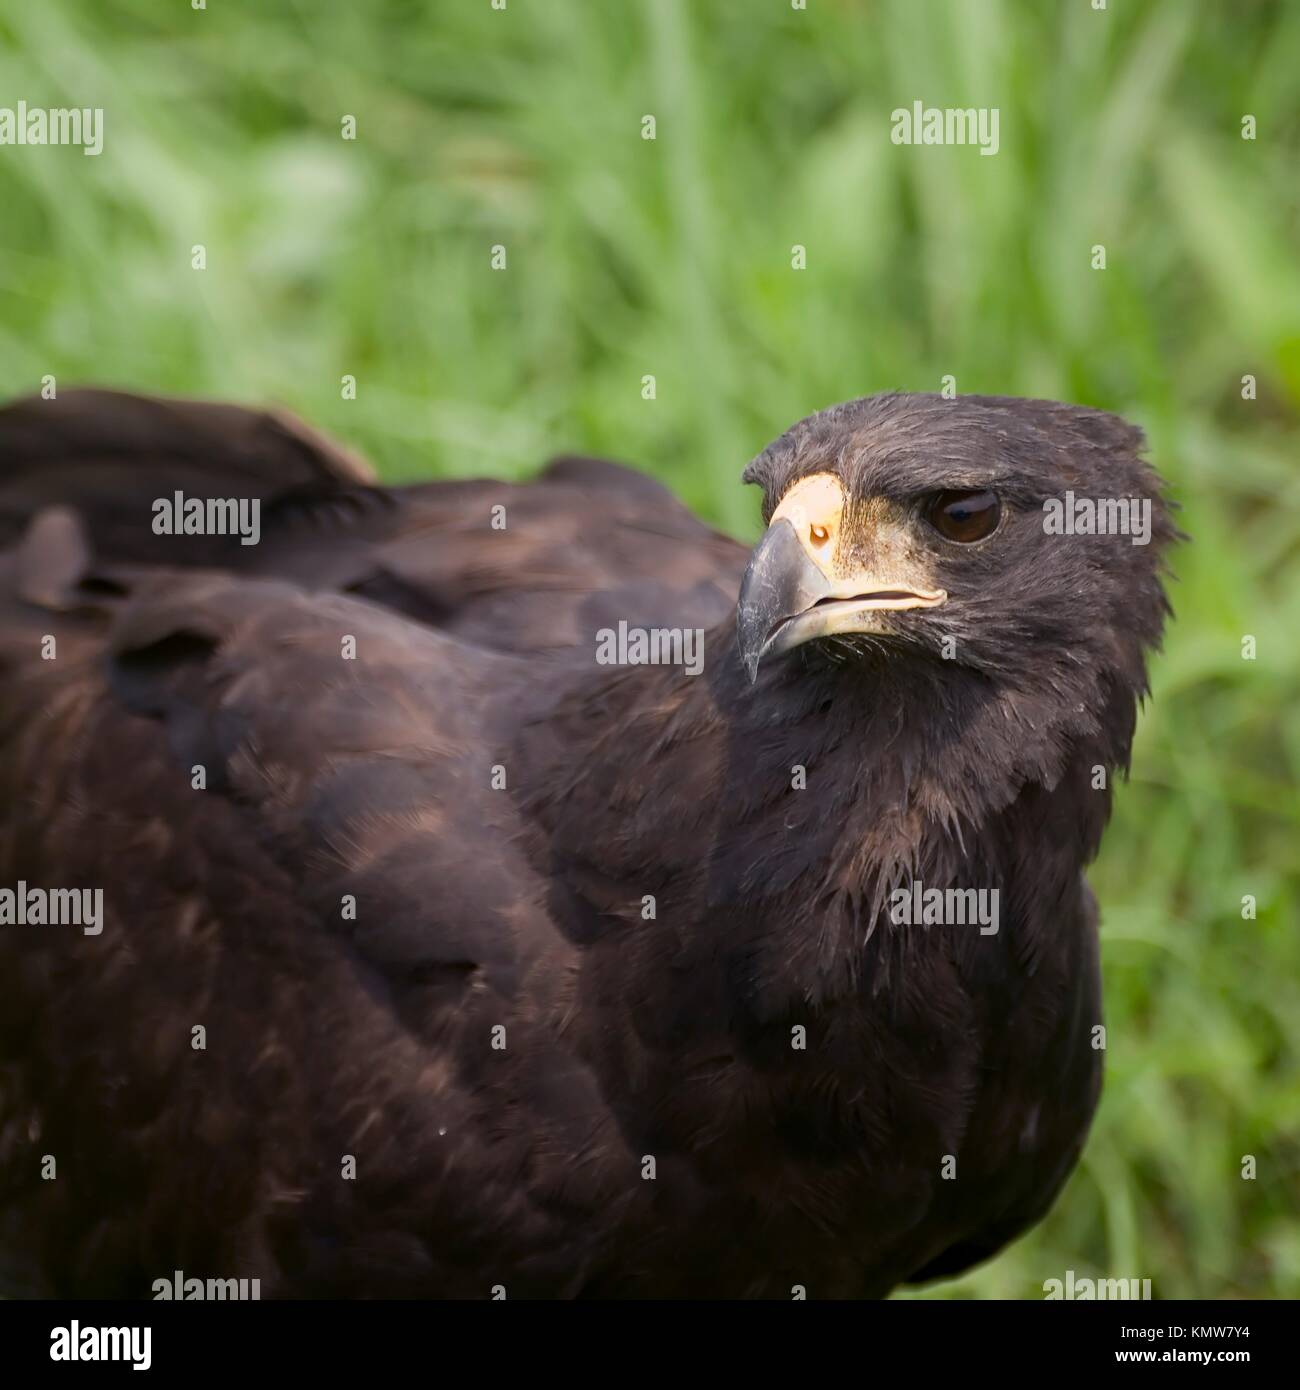 Great Black Hawk , Pantanal, Mato Grosso, Brazil / Buteogallus urubitinga - Accipitridae Family – Falconiformes - Stock Image